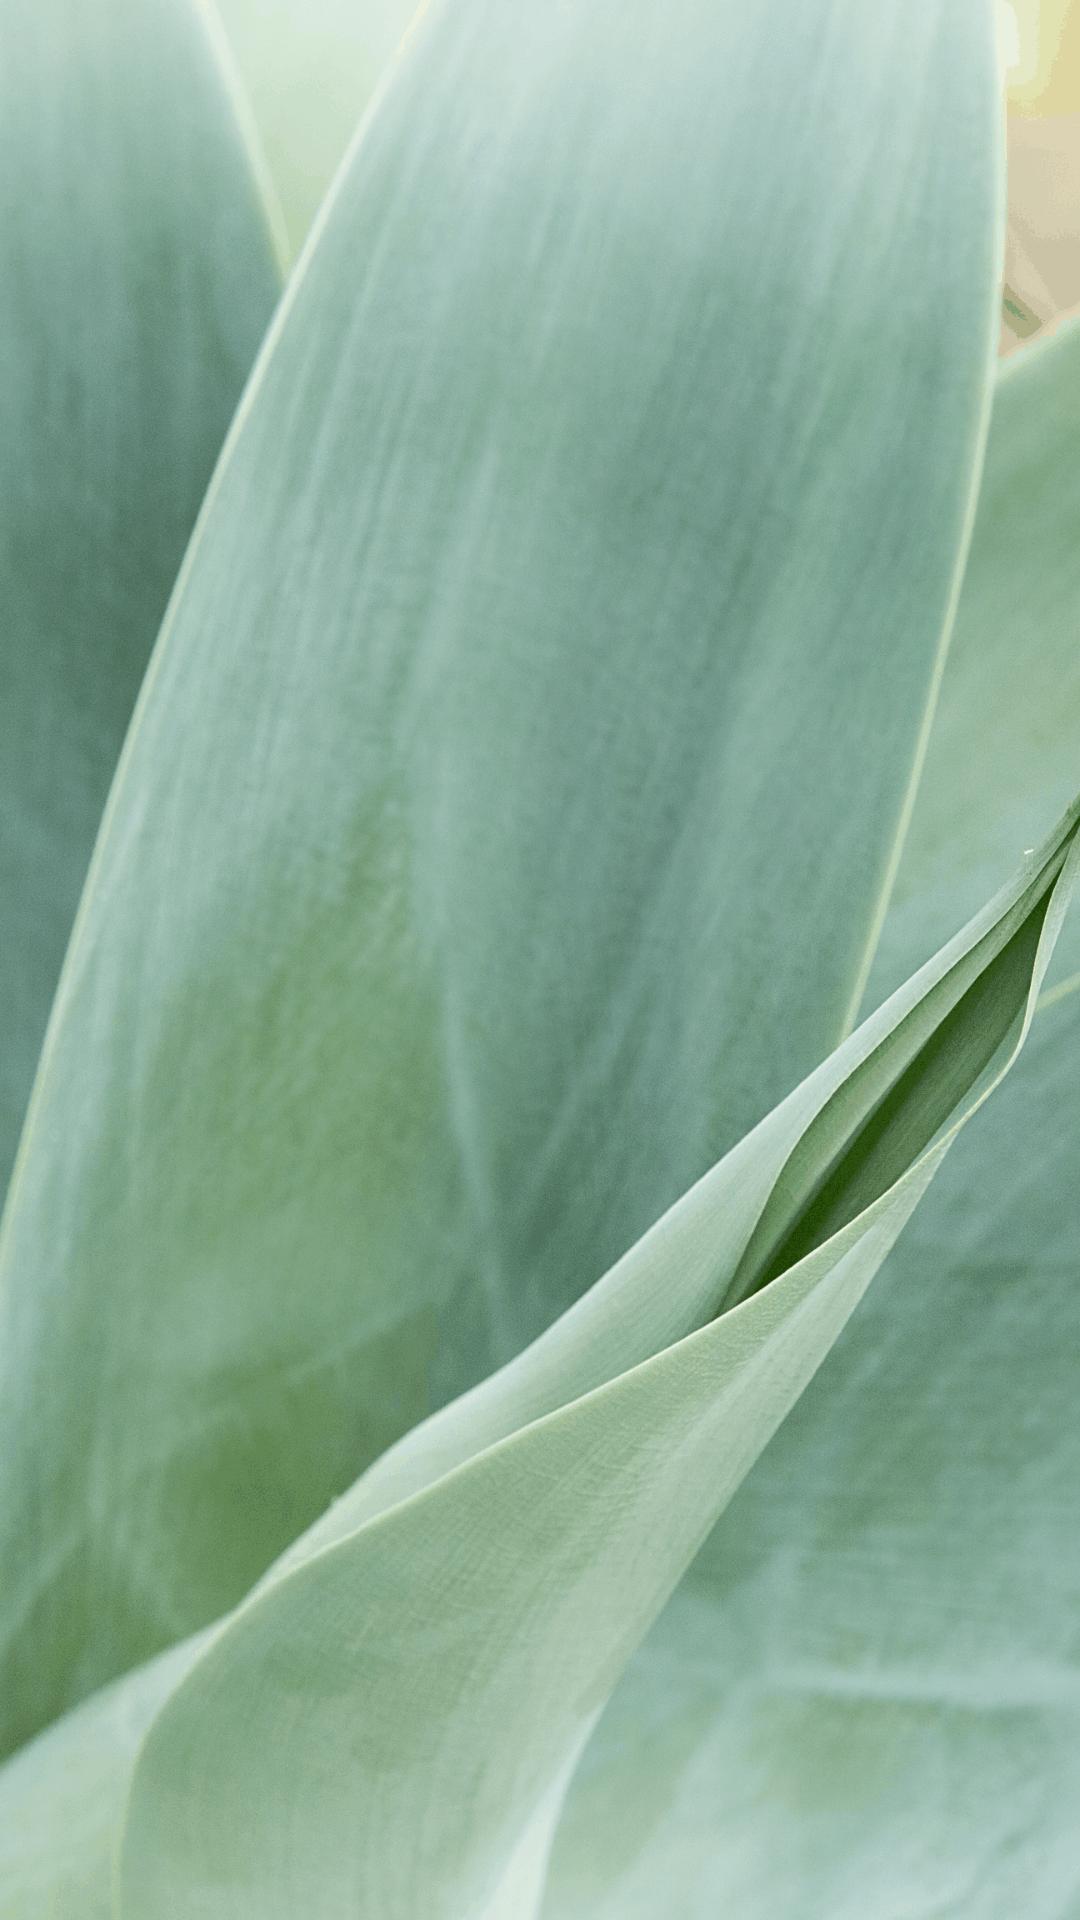 1080x1920 Sage Green Aesthetic Wallpaper Plants - Novocom.top